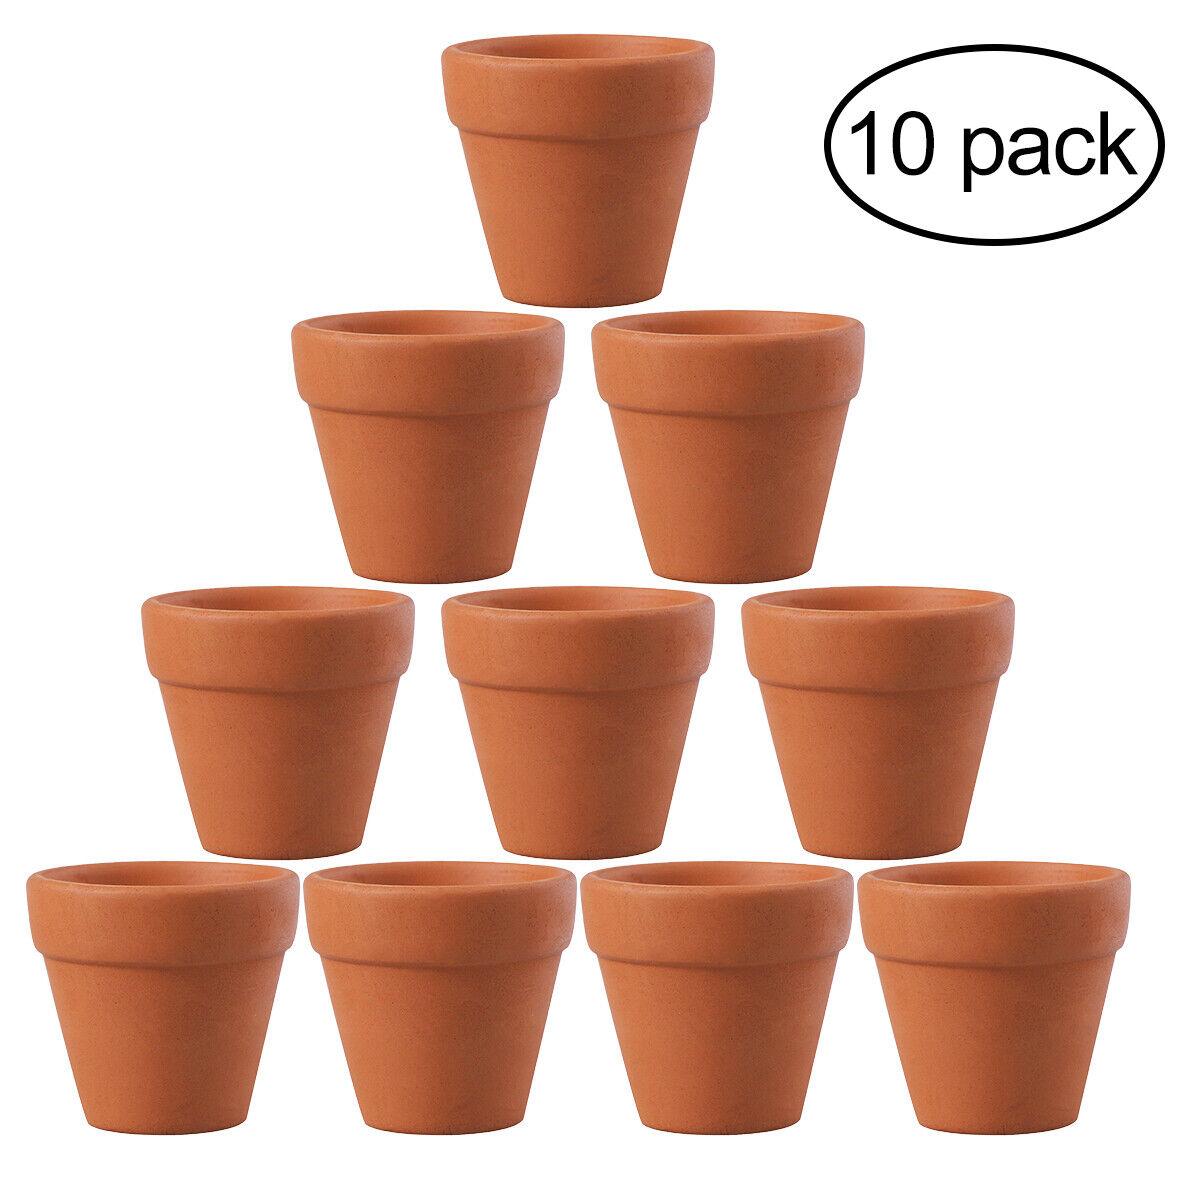 10Pcs Mini Clay Ceramic Terracotta Pot Flower Plants Pots Craft Wedding Favor